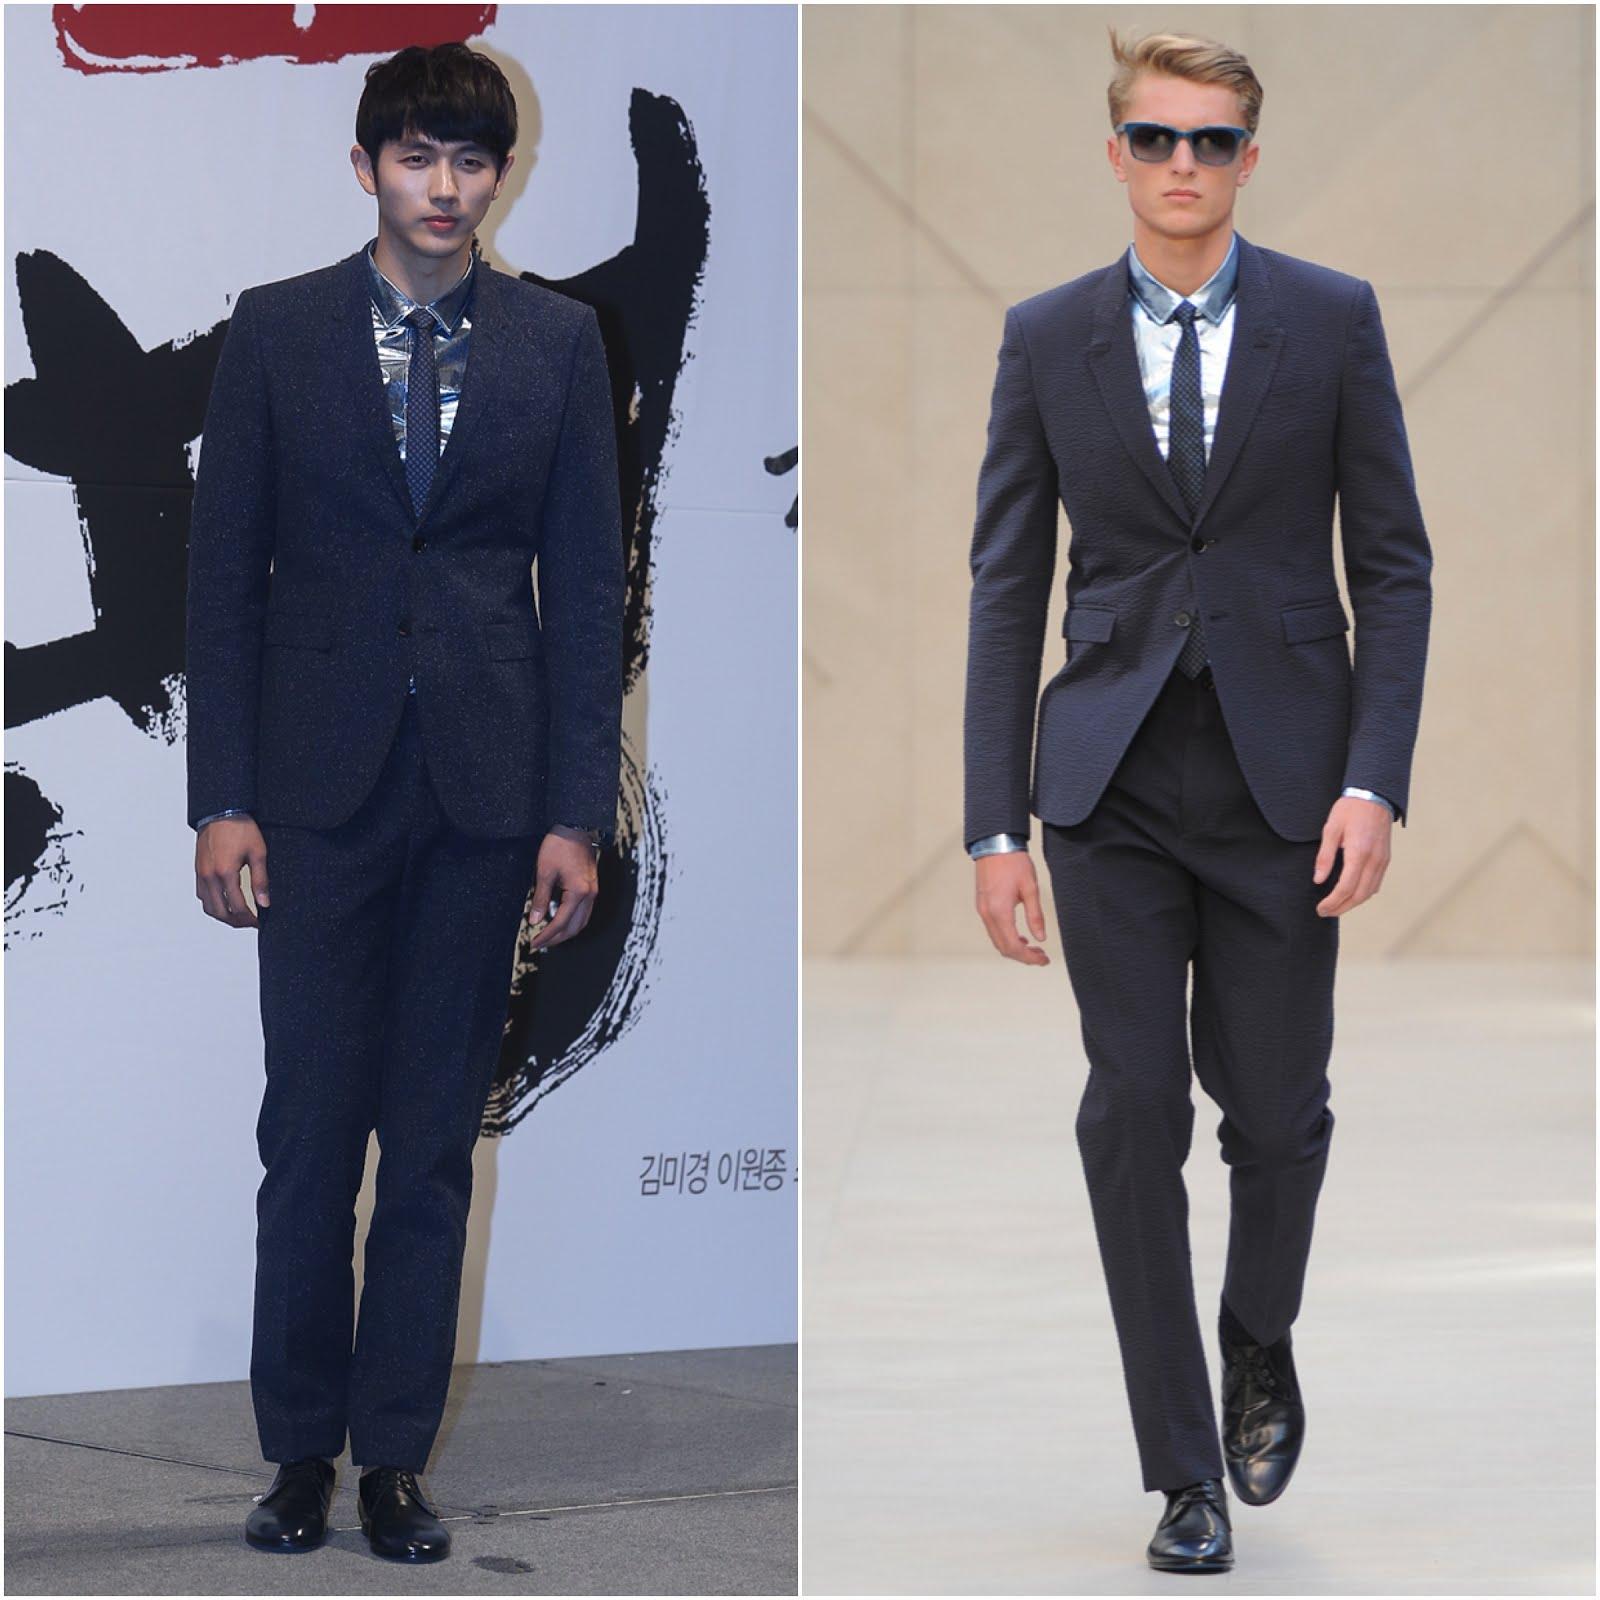 00O00 Menswear blog Im Seulong [任瑟雍] in Burberry Prorsum menswear -